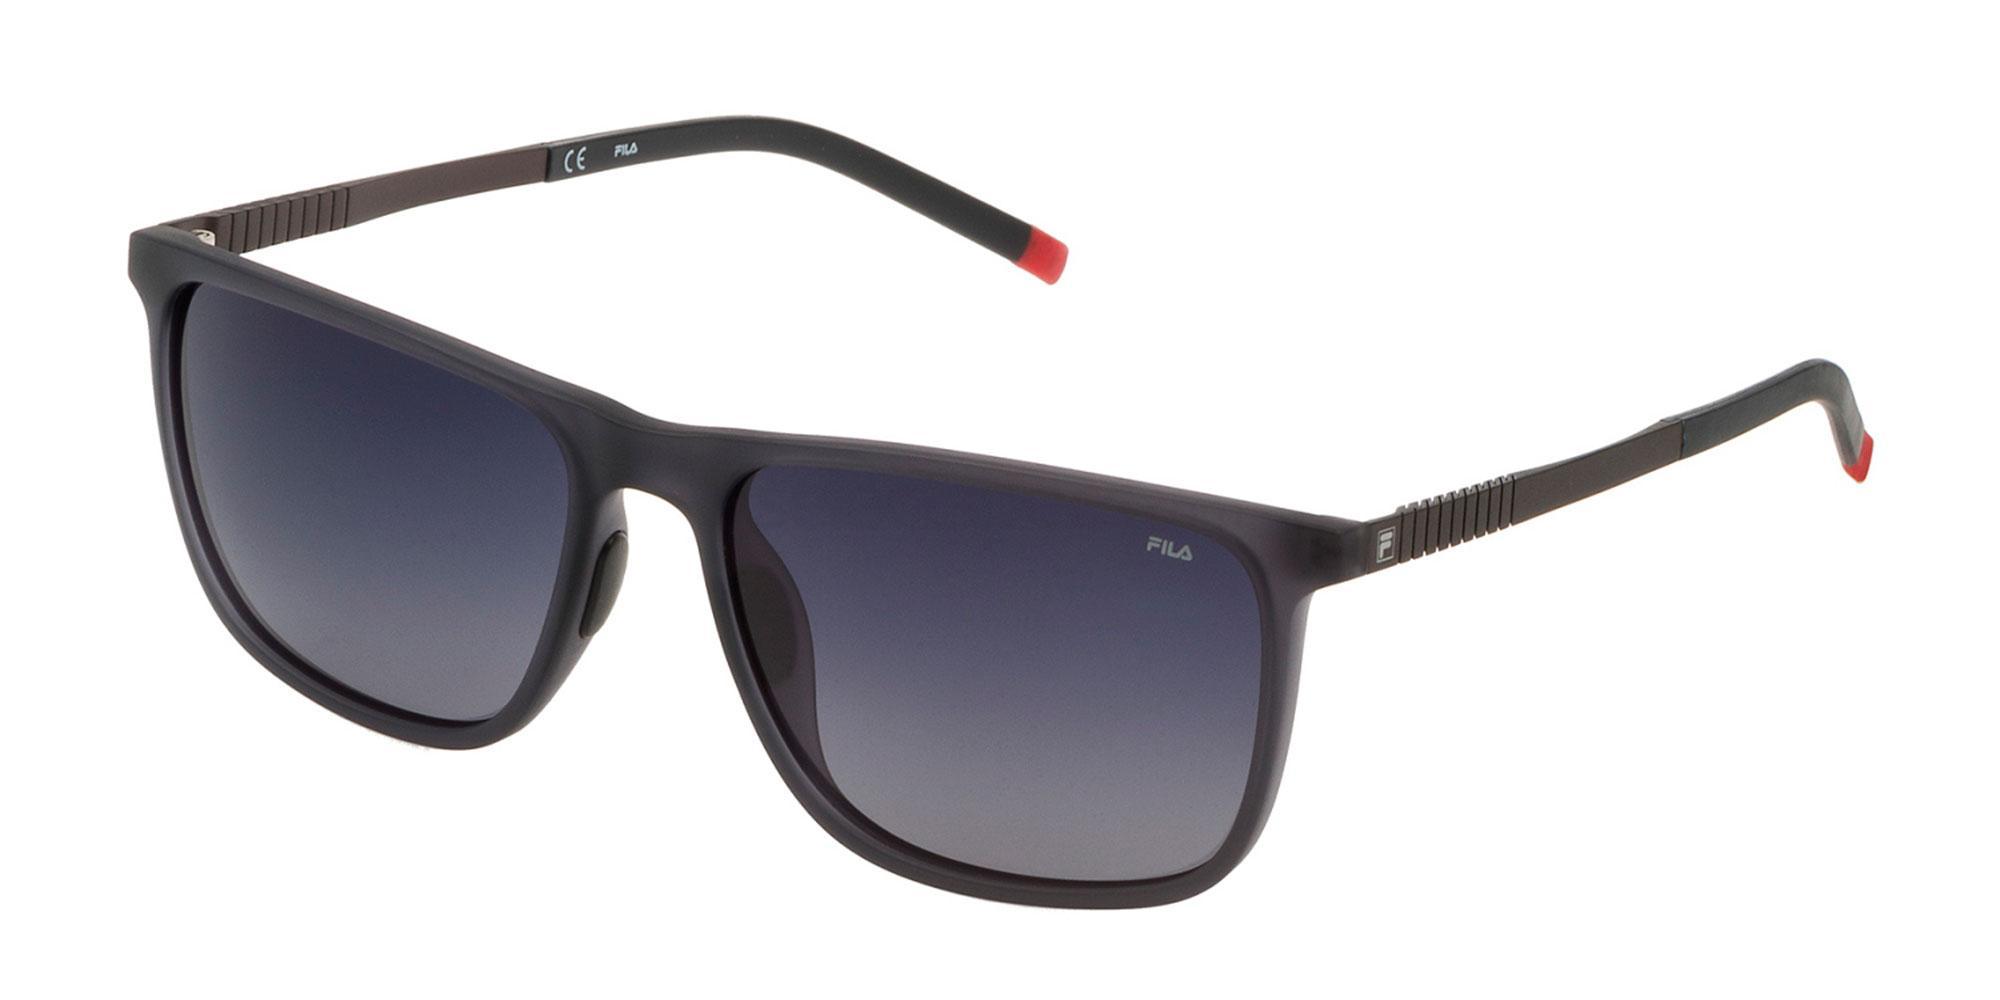 4G0P SF9247 Sunglasses, Fila